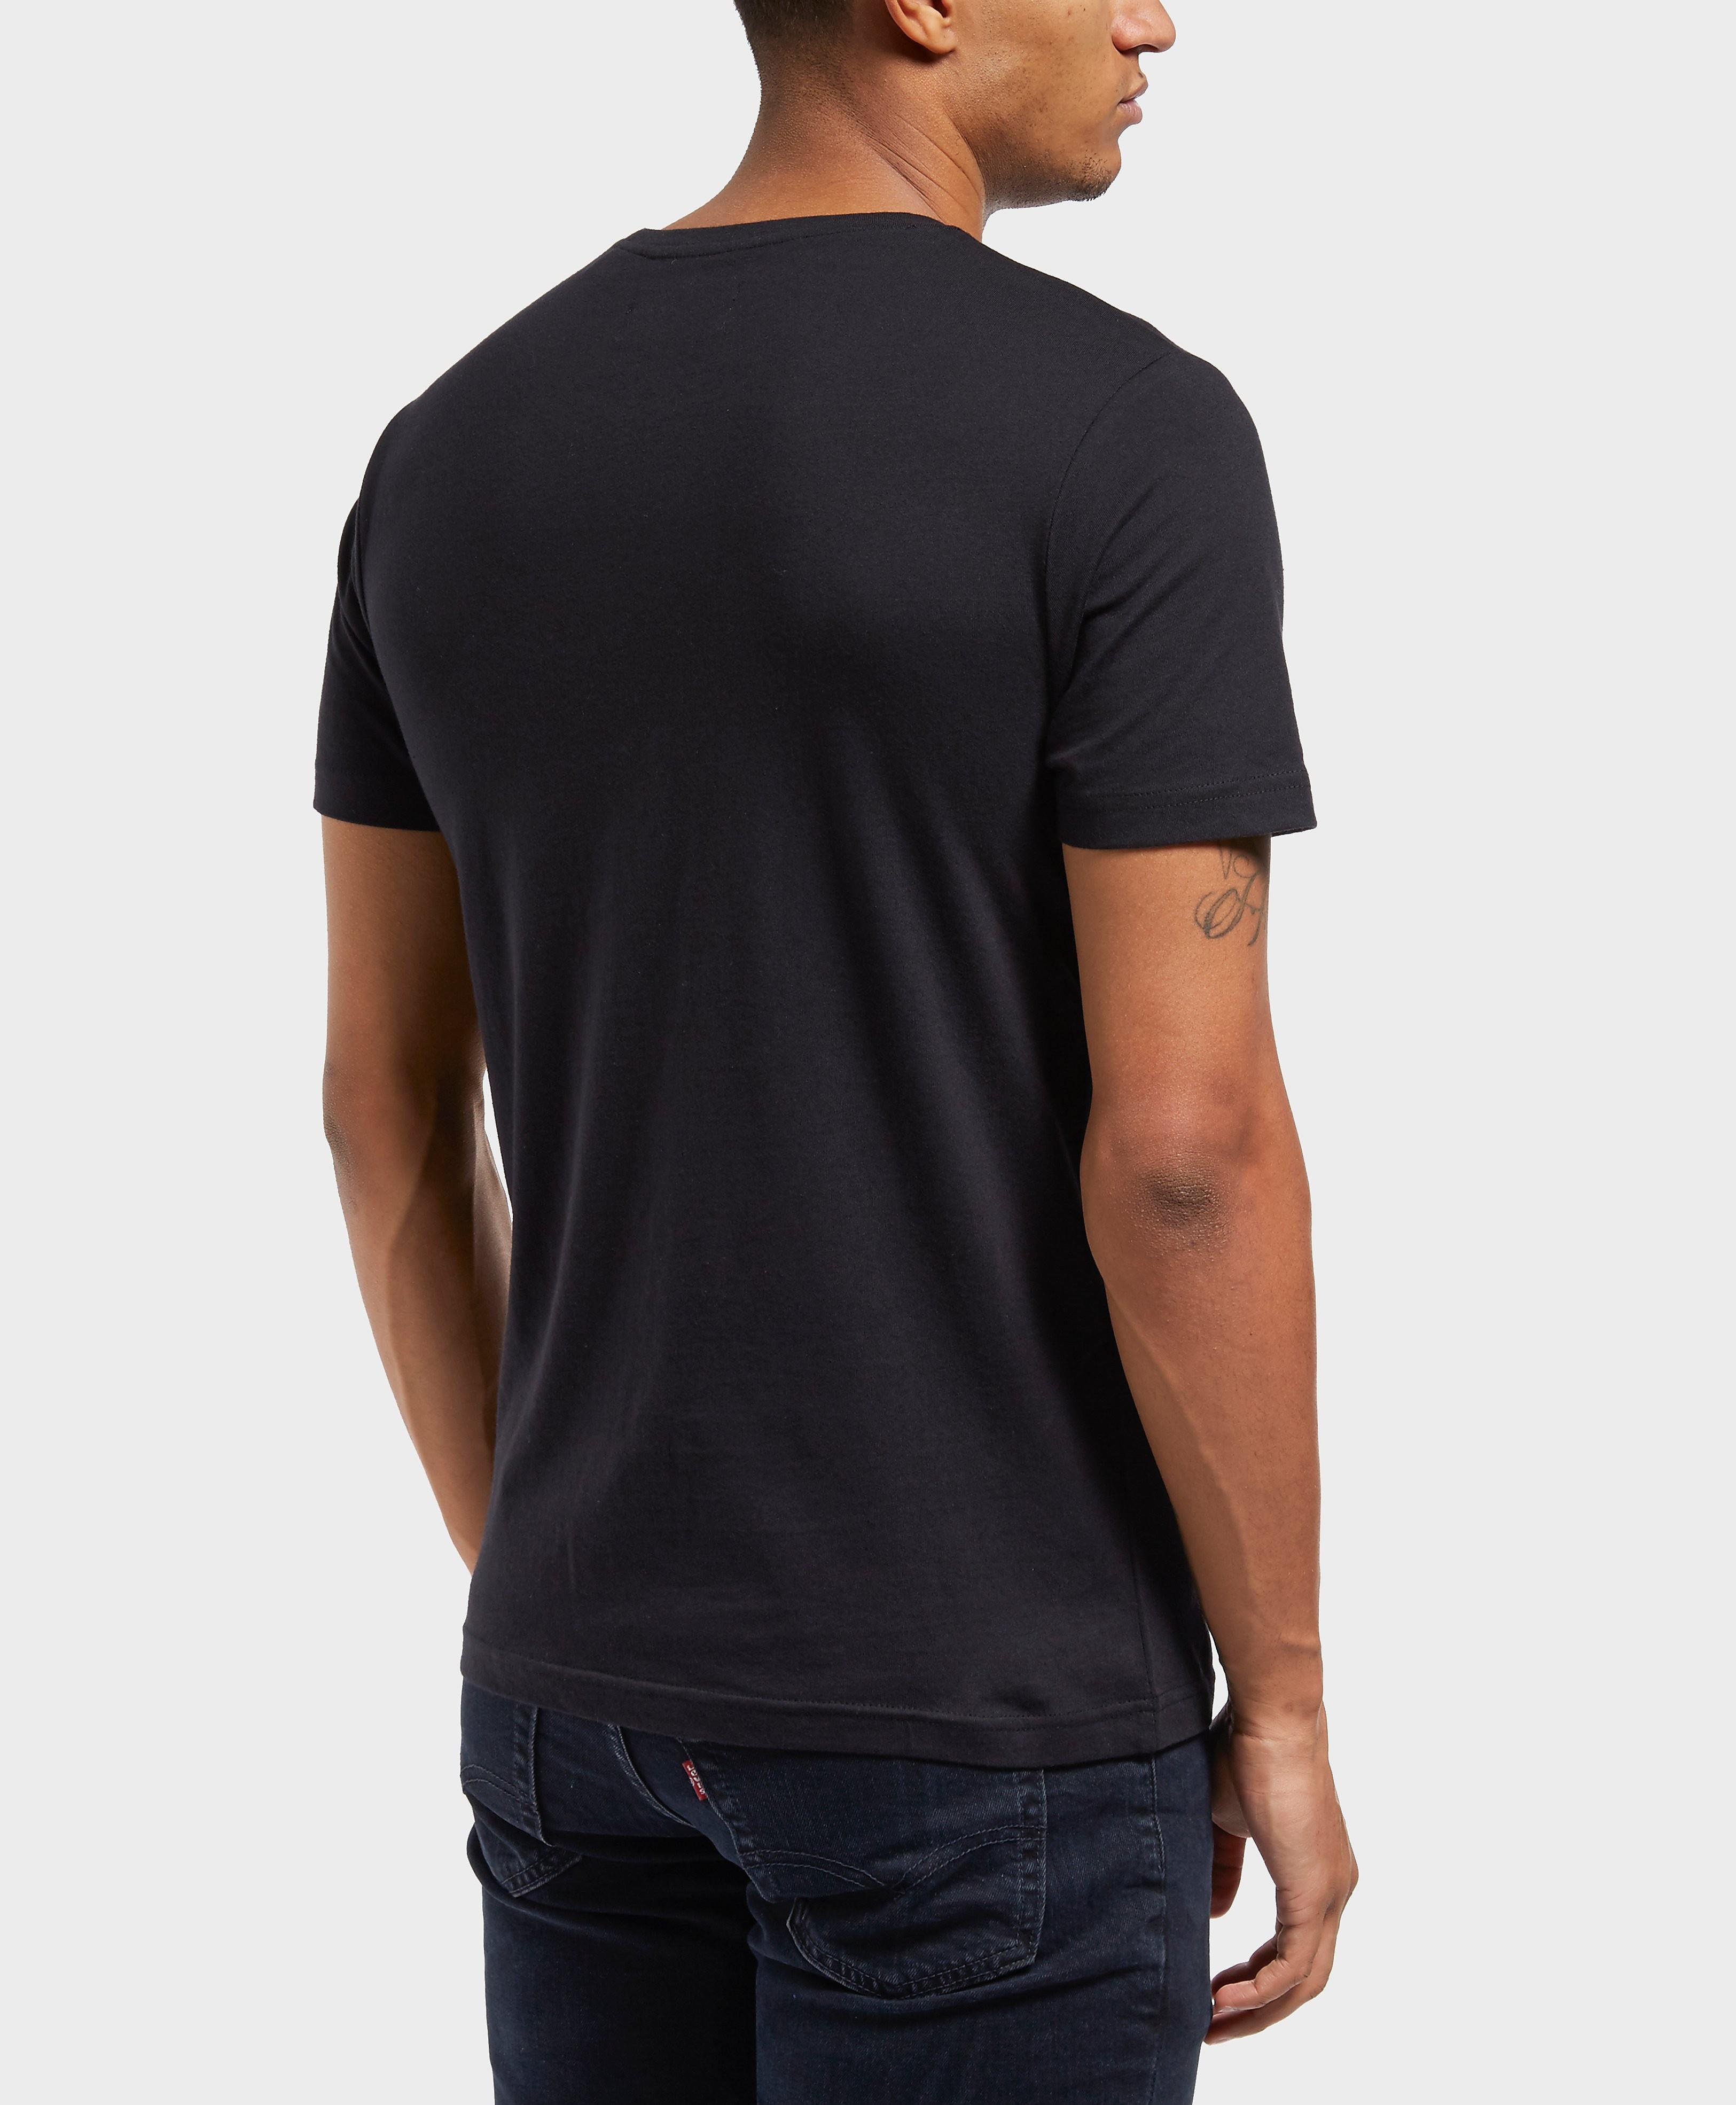 Original Penguin Logo Short Sleeve T-Shirt - Exclusive